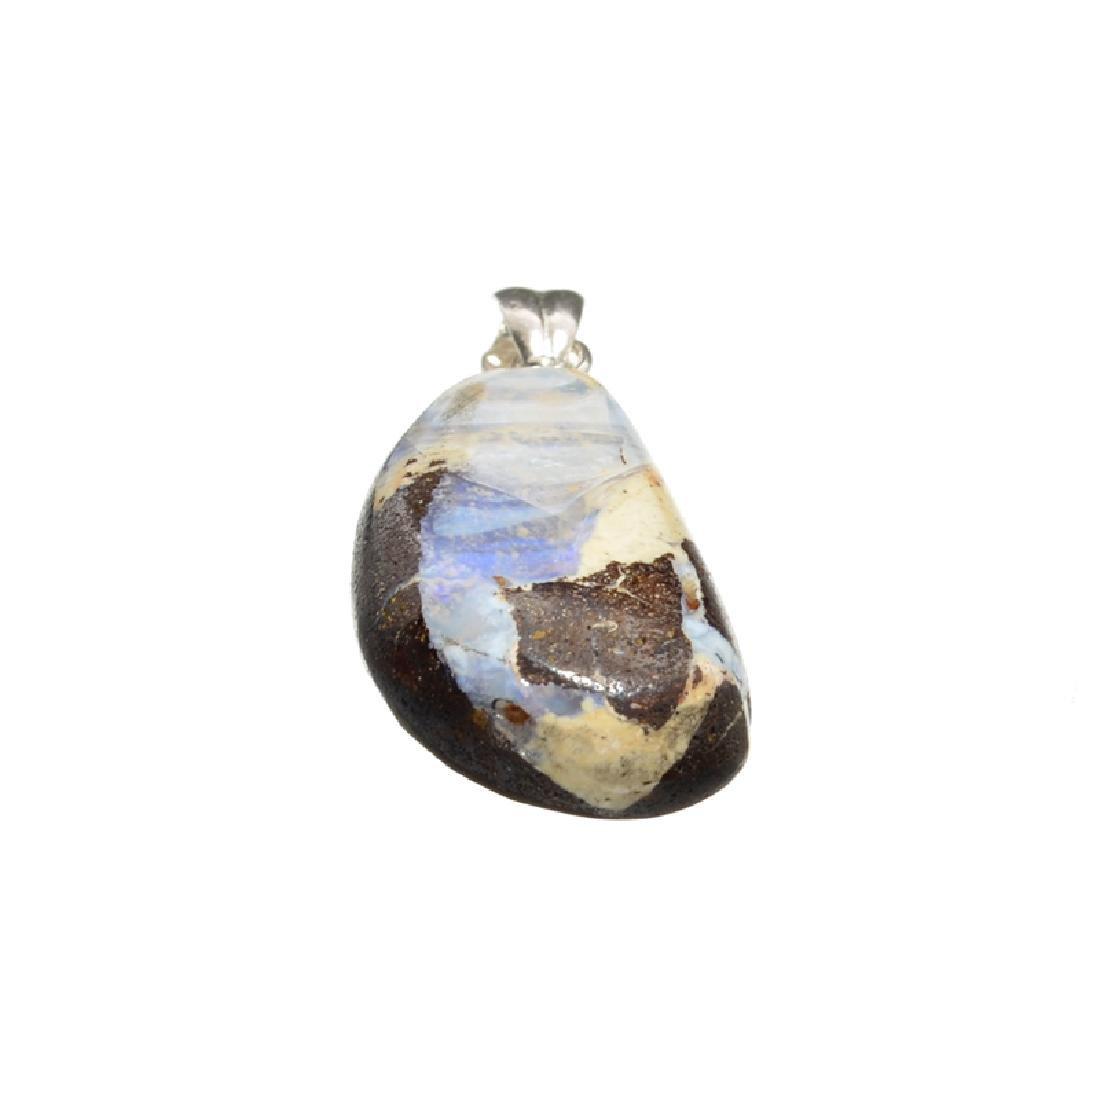 13.95CT Boulder Opal Sterling Silver Pendant